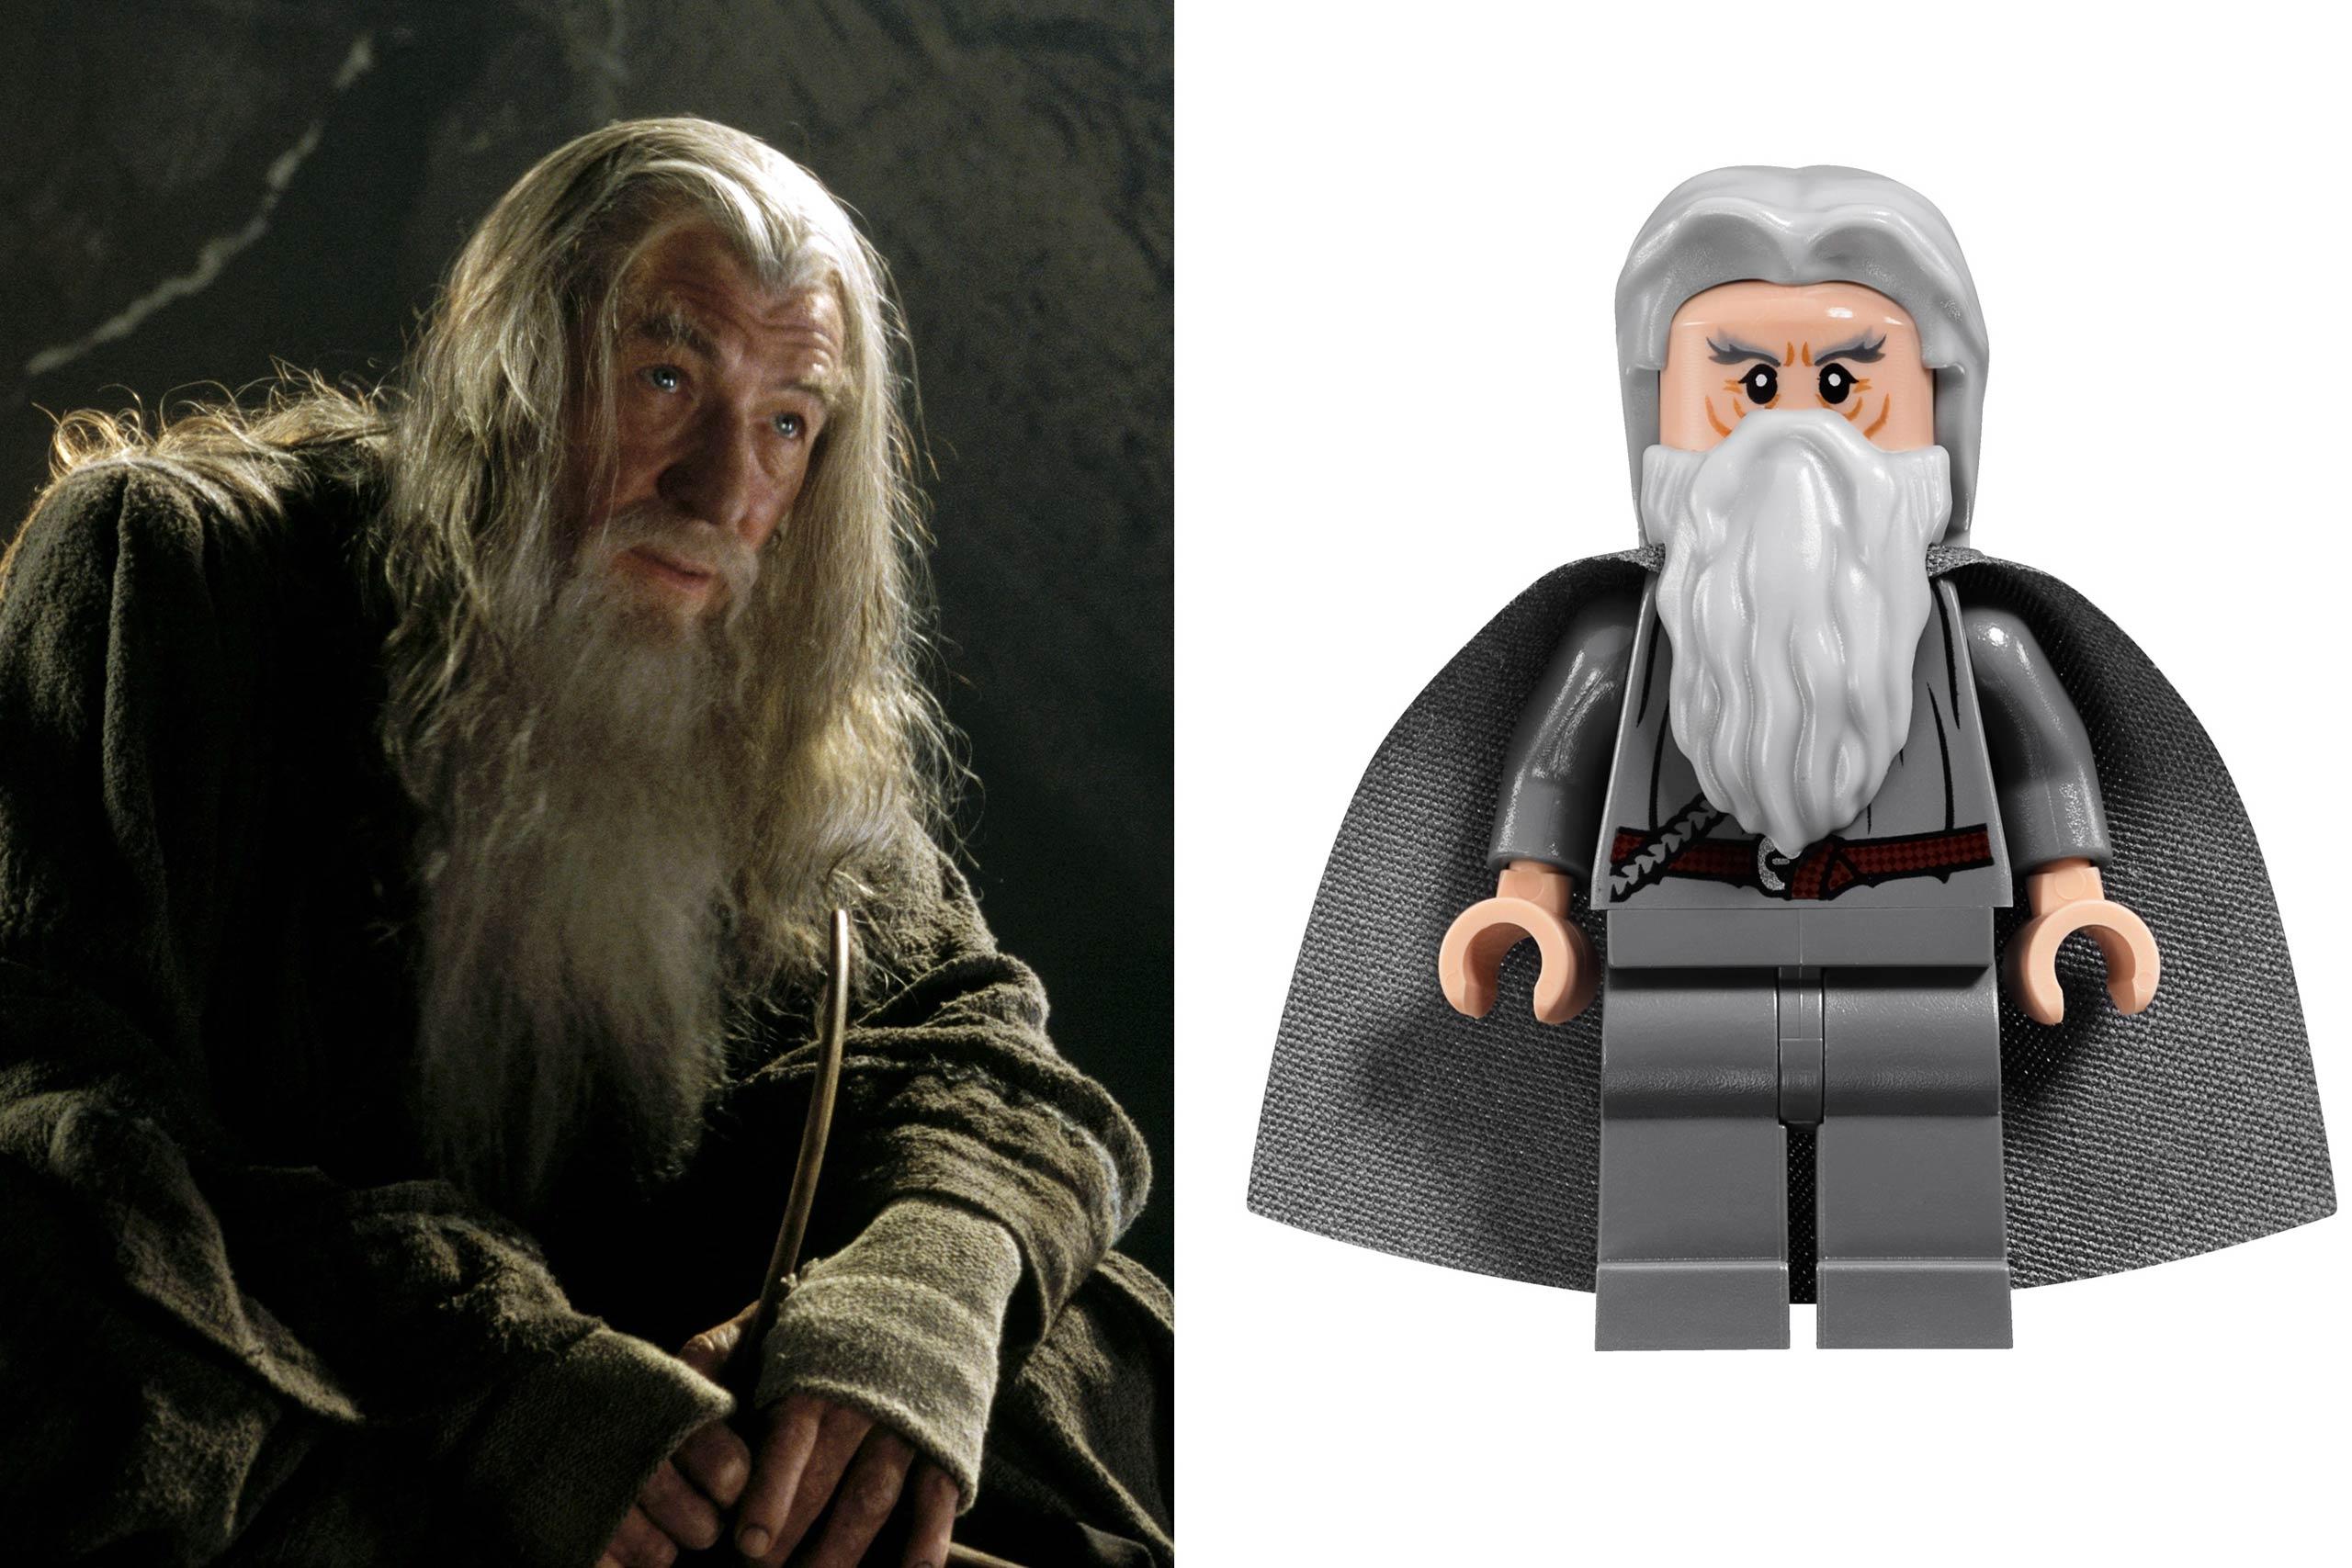 <strong>Sir Ian Mckellen: Gandalf the Grey</strong>